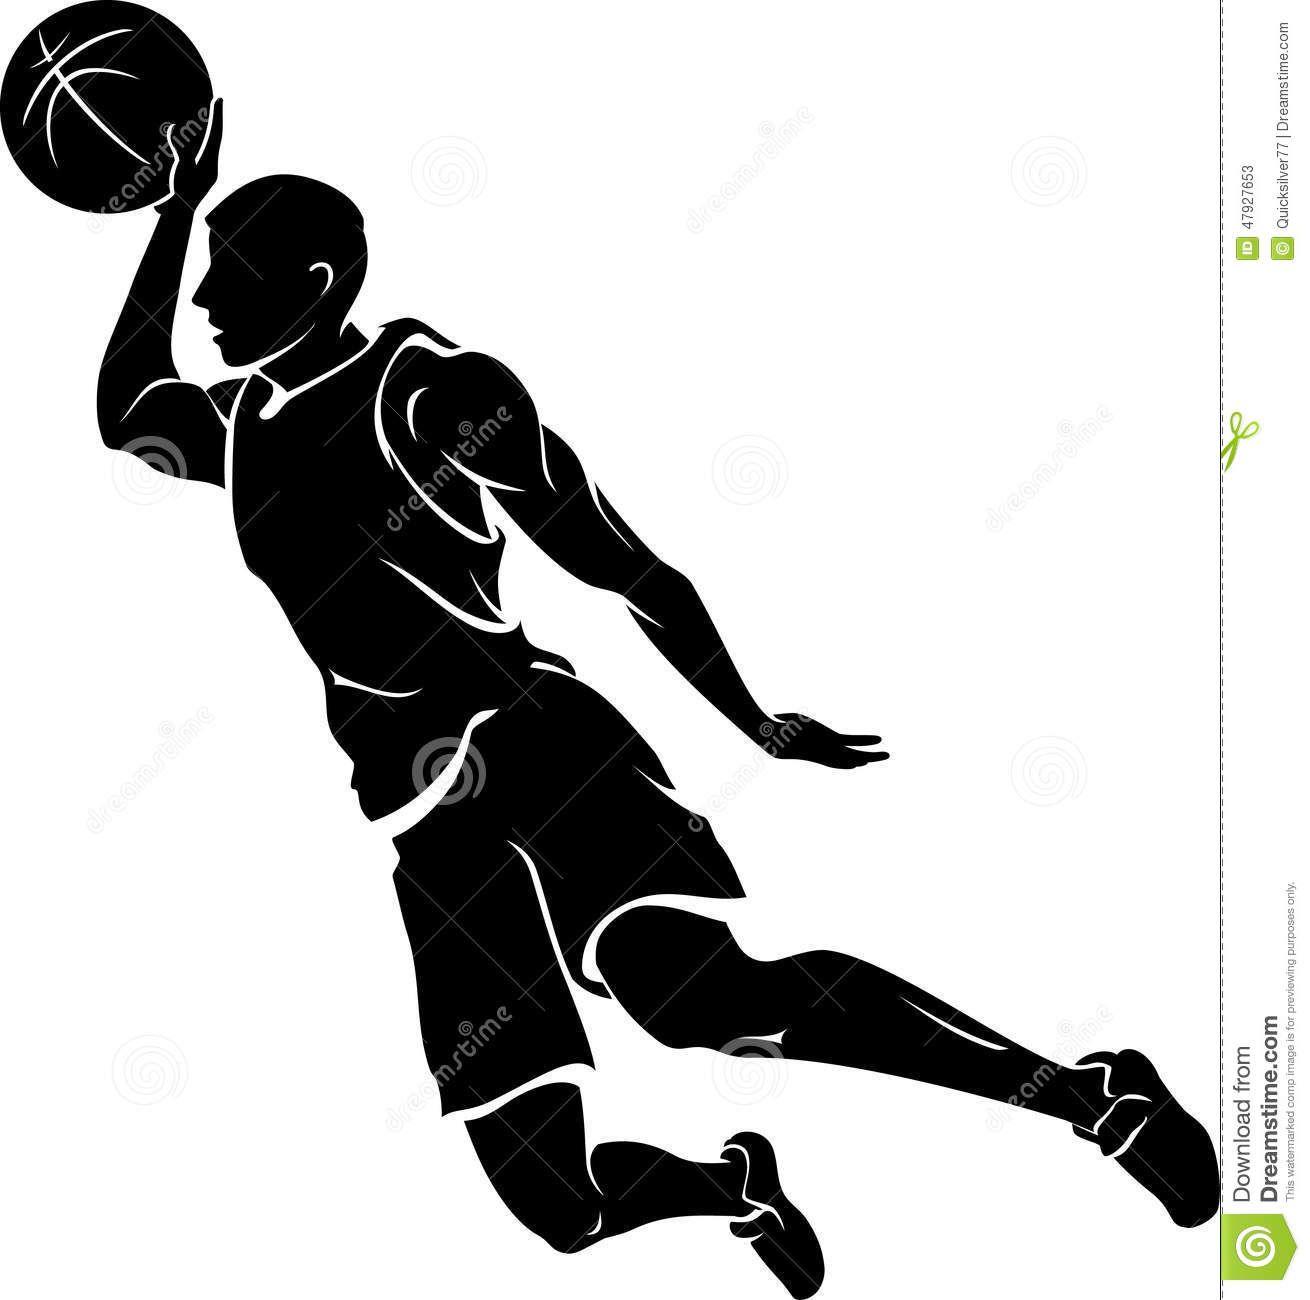 1310x1300 Silhouette Basketball Dunk